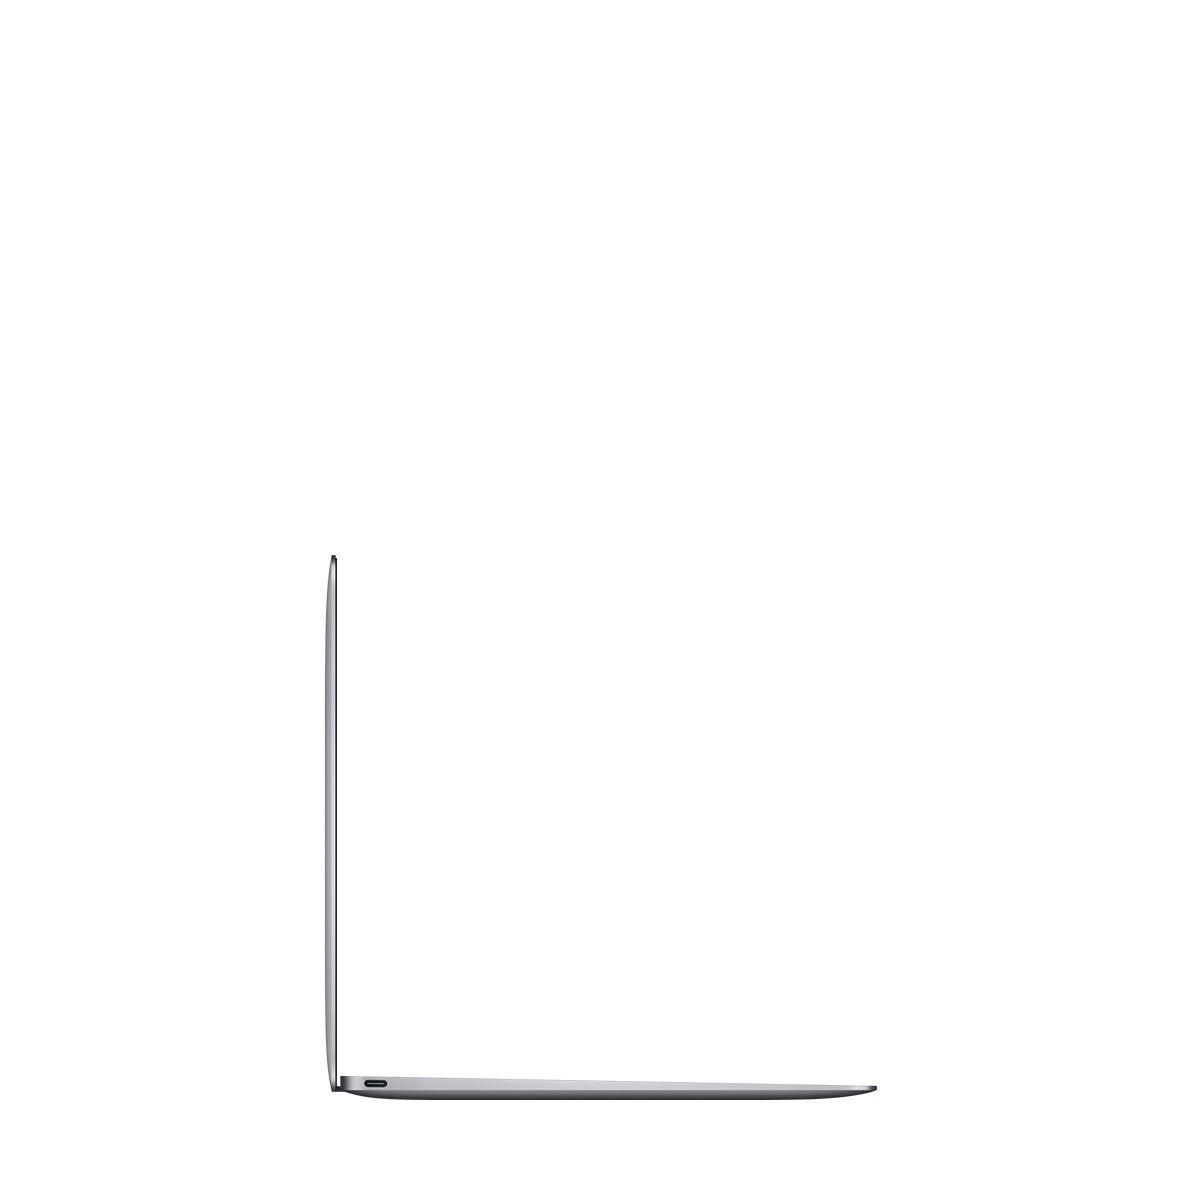 Apple MacBook 12inch | 1.2GHz Processor | 256GB Storage - Space Grey BG  - 3